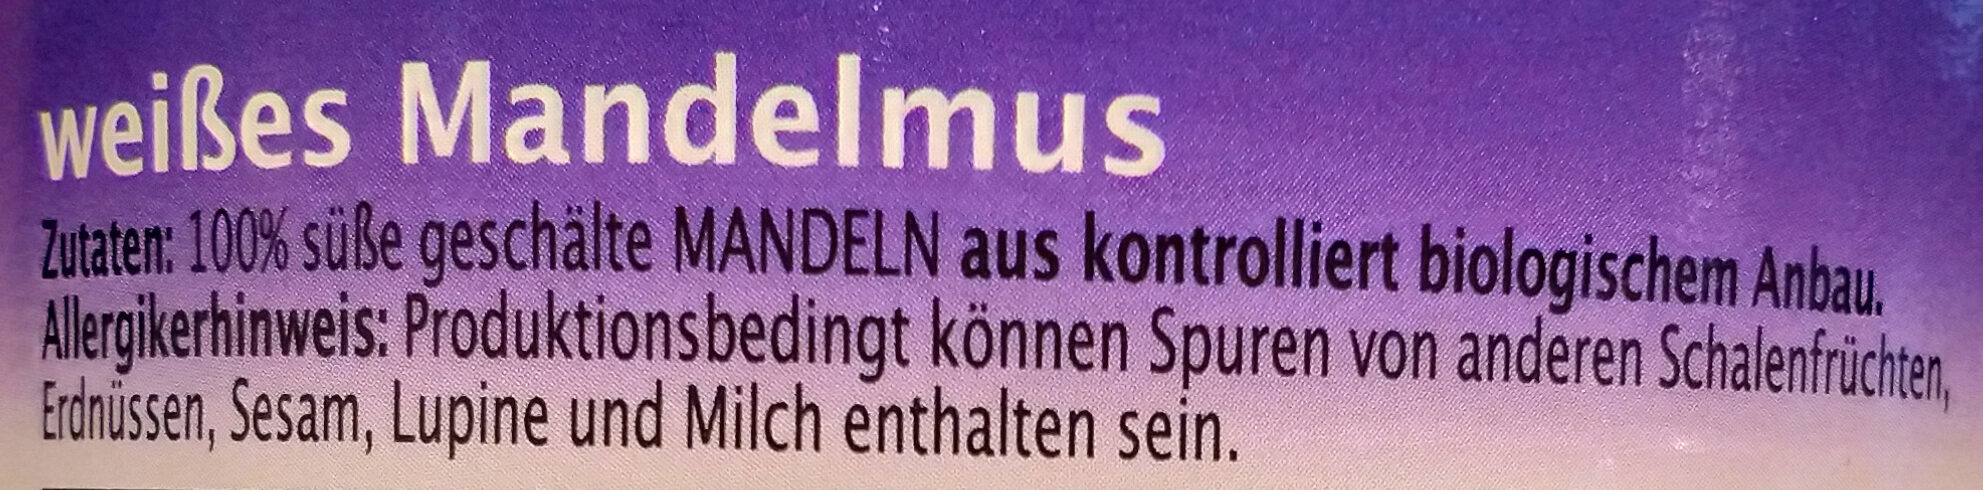 Rapunzel Weißes Mandelmus, 500 GR Glas - Ingrédients - de